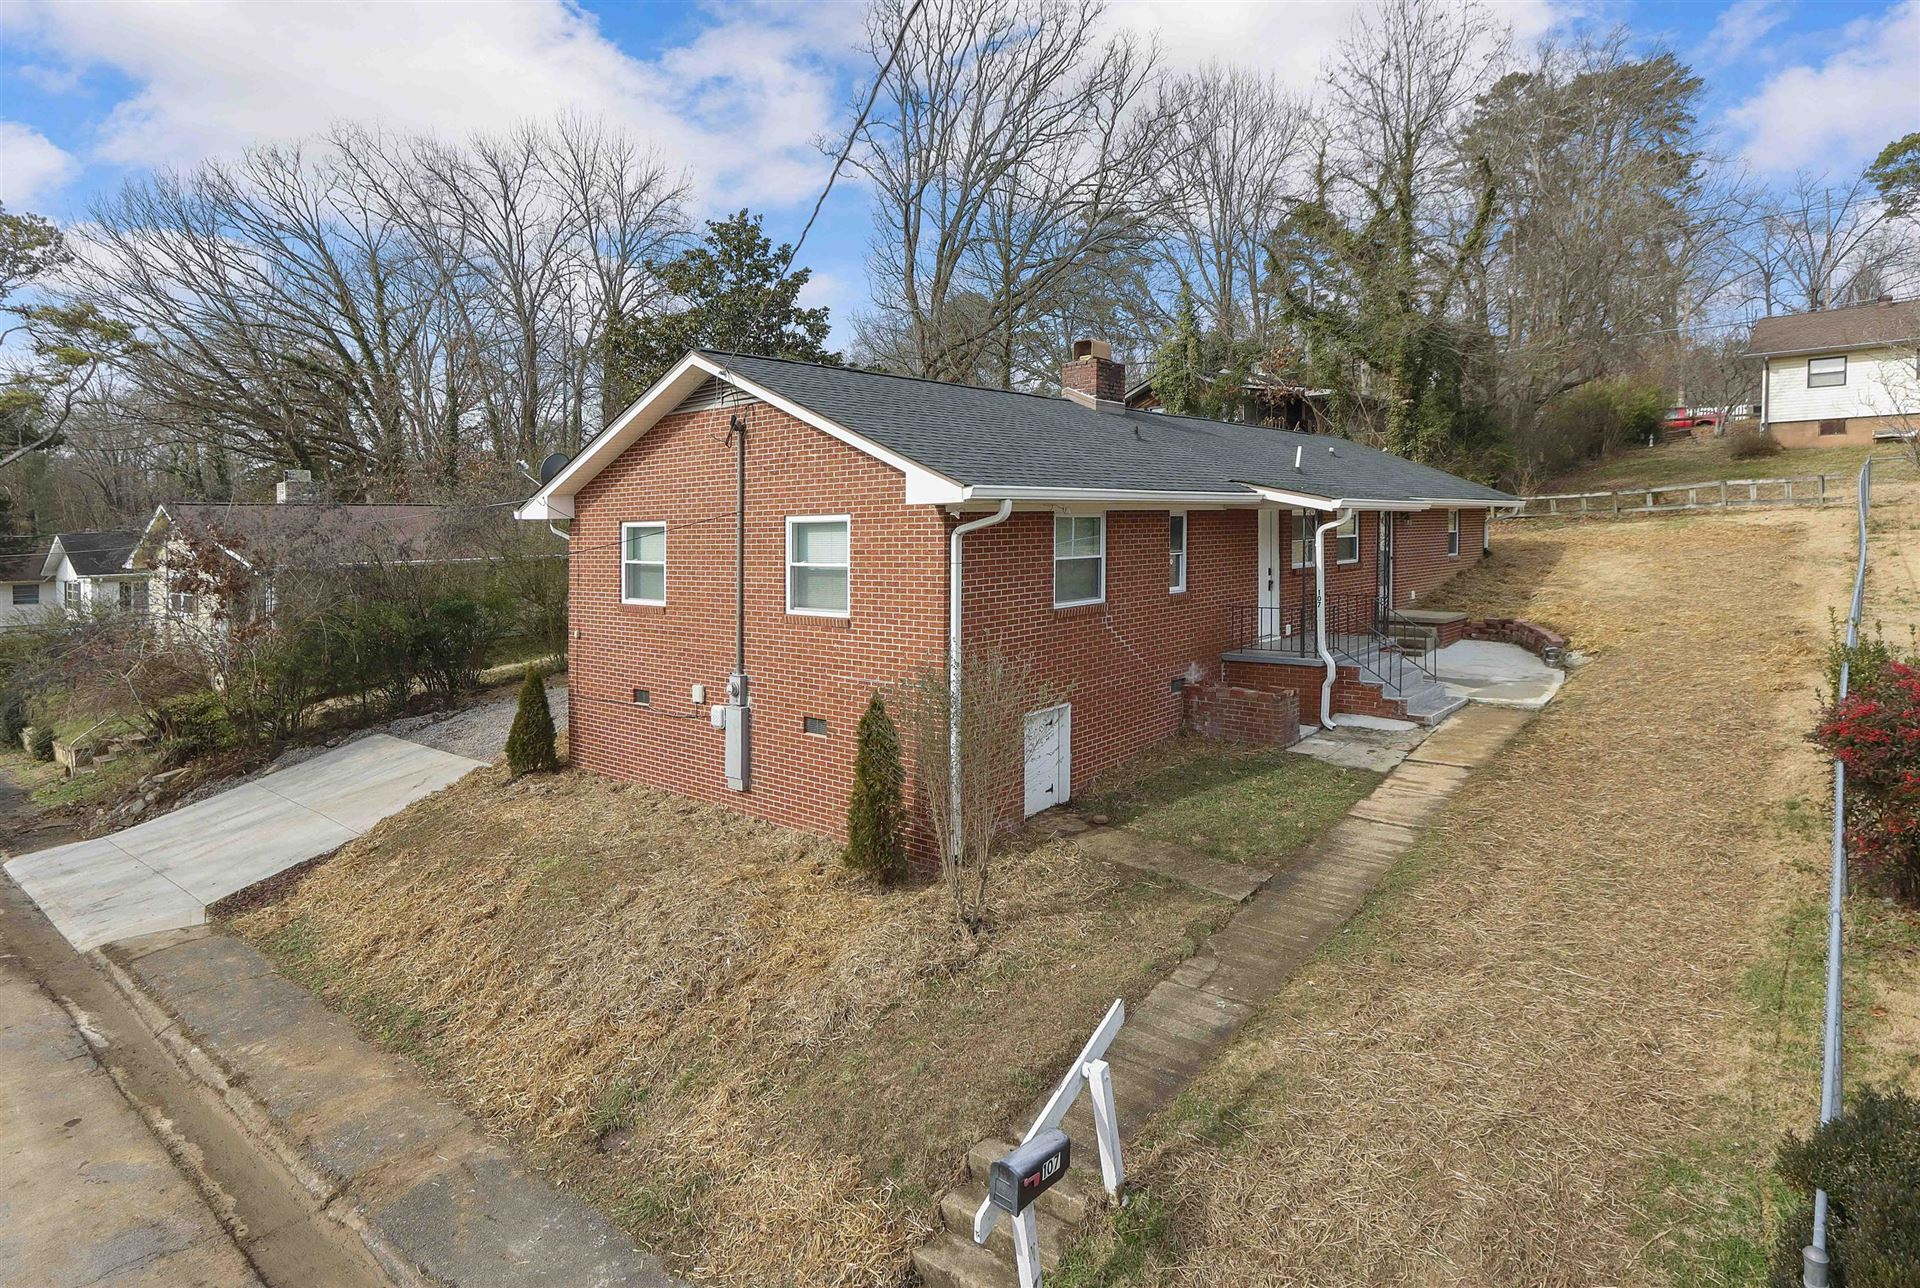 Photo of 107 Tucker Rd, Oak Ridge, TN 37830 (MLS # 1139610)